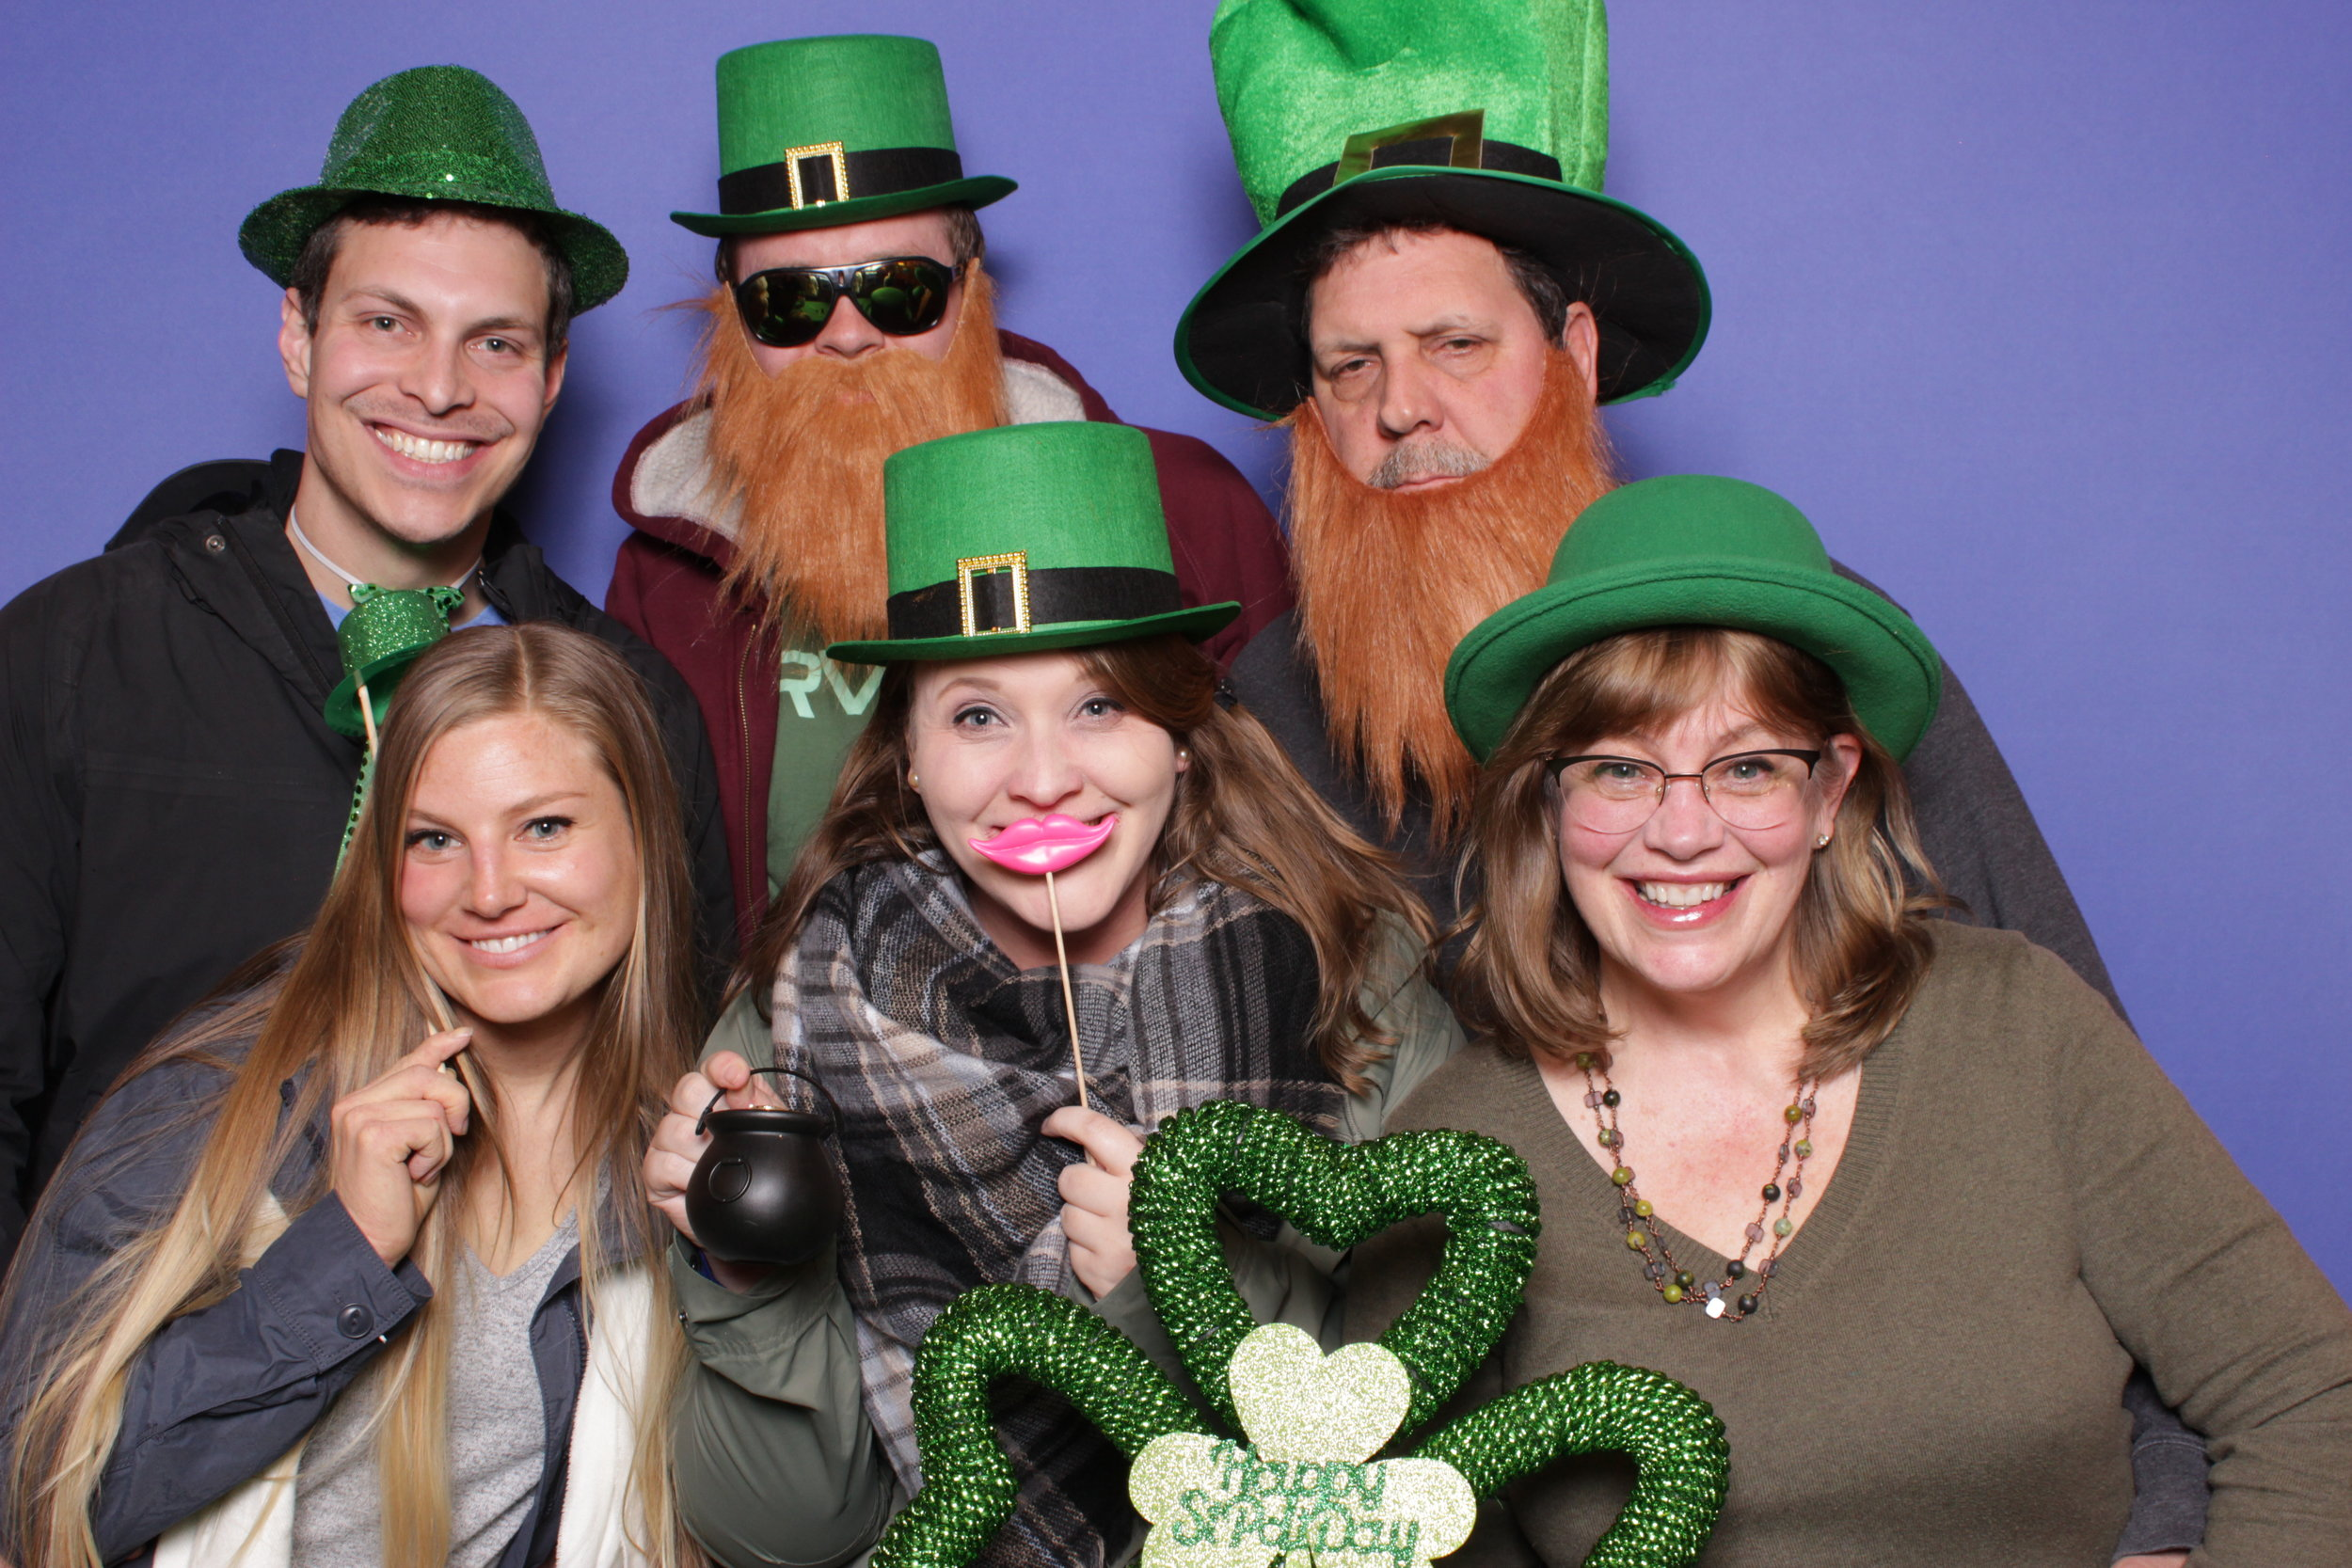 St. Patrick's Across the Land